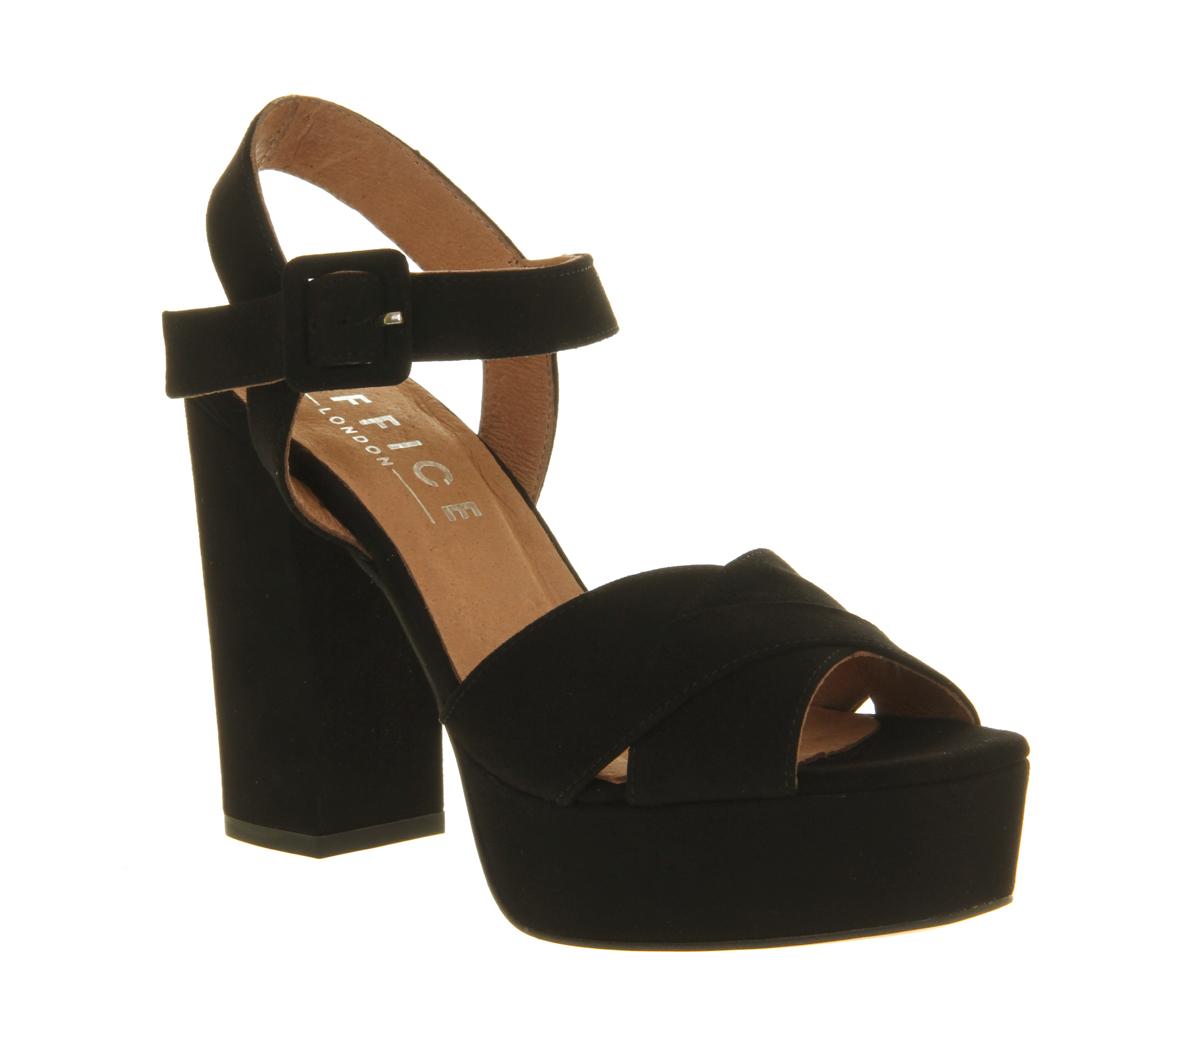 Office Onward Platform Sandal in Black | Lyst